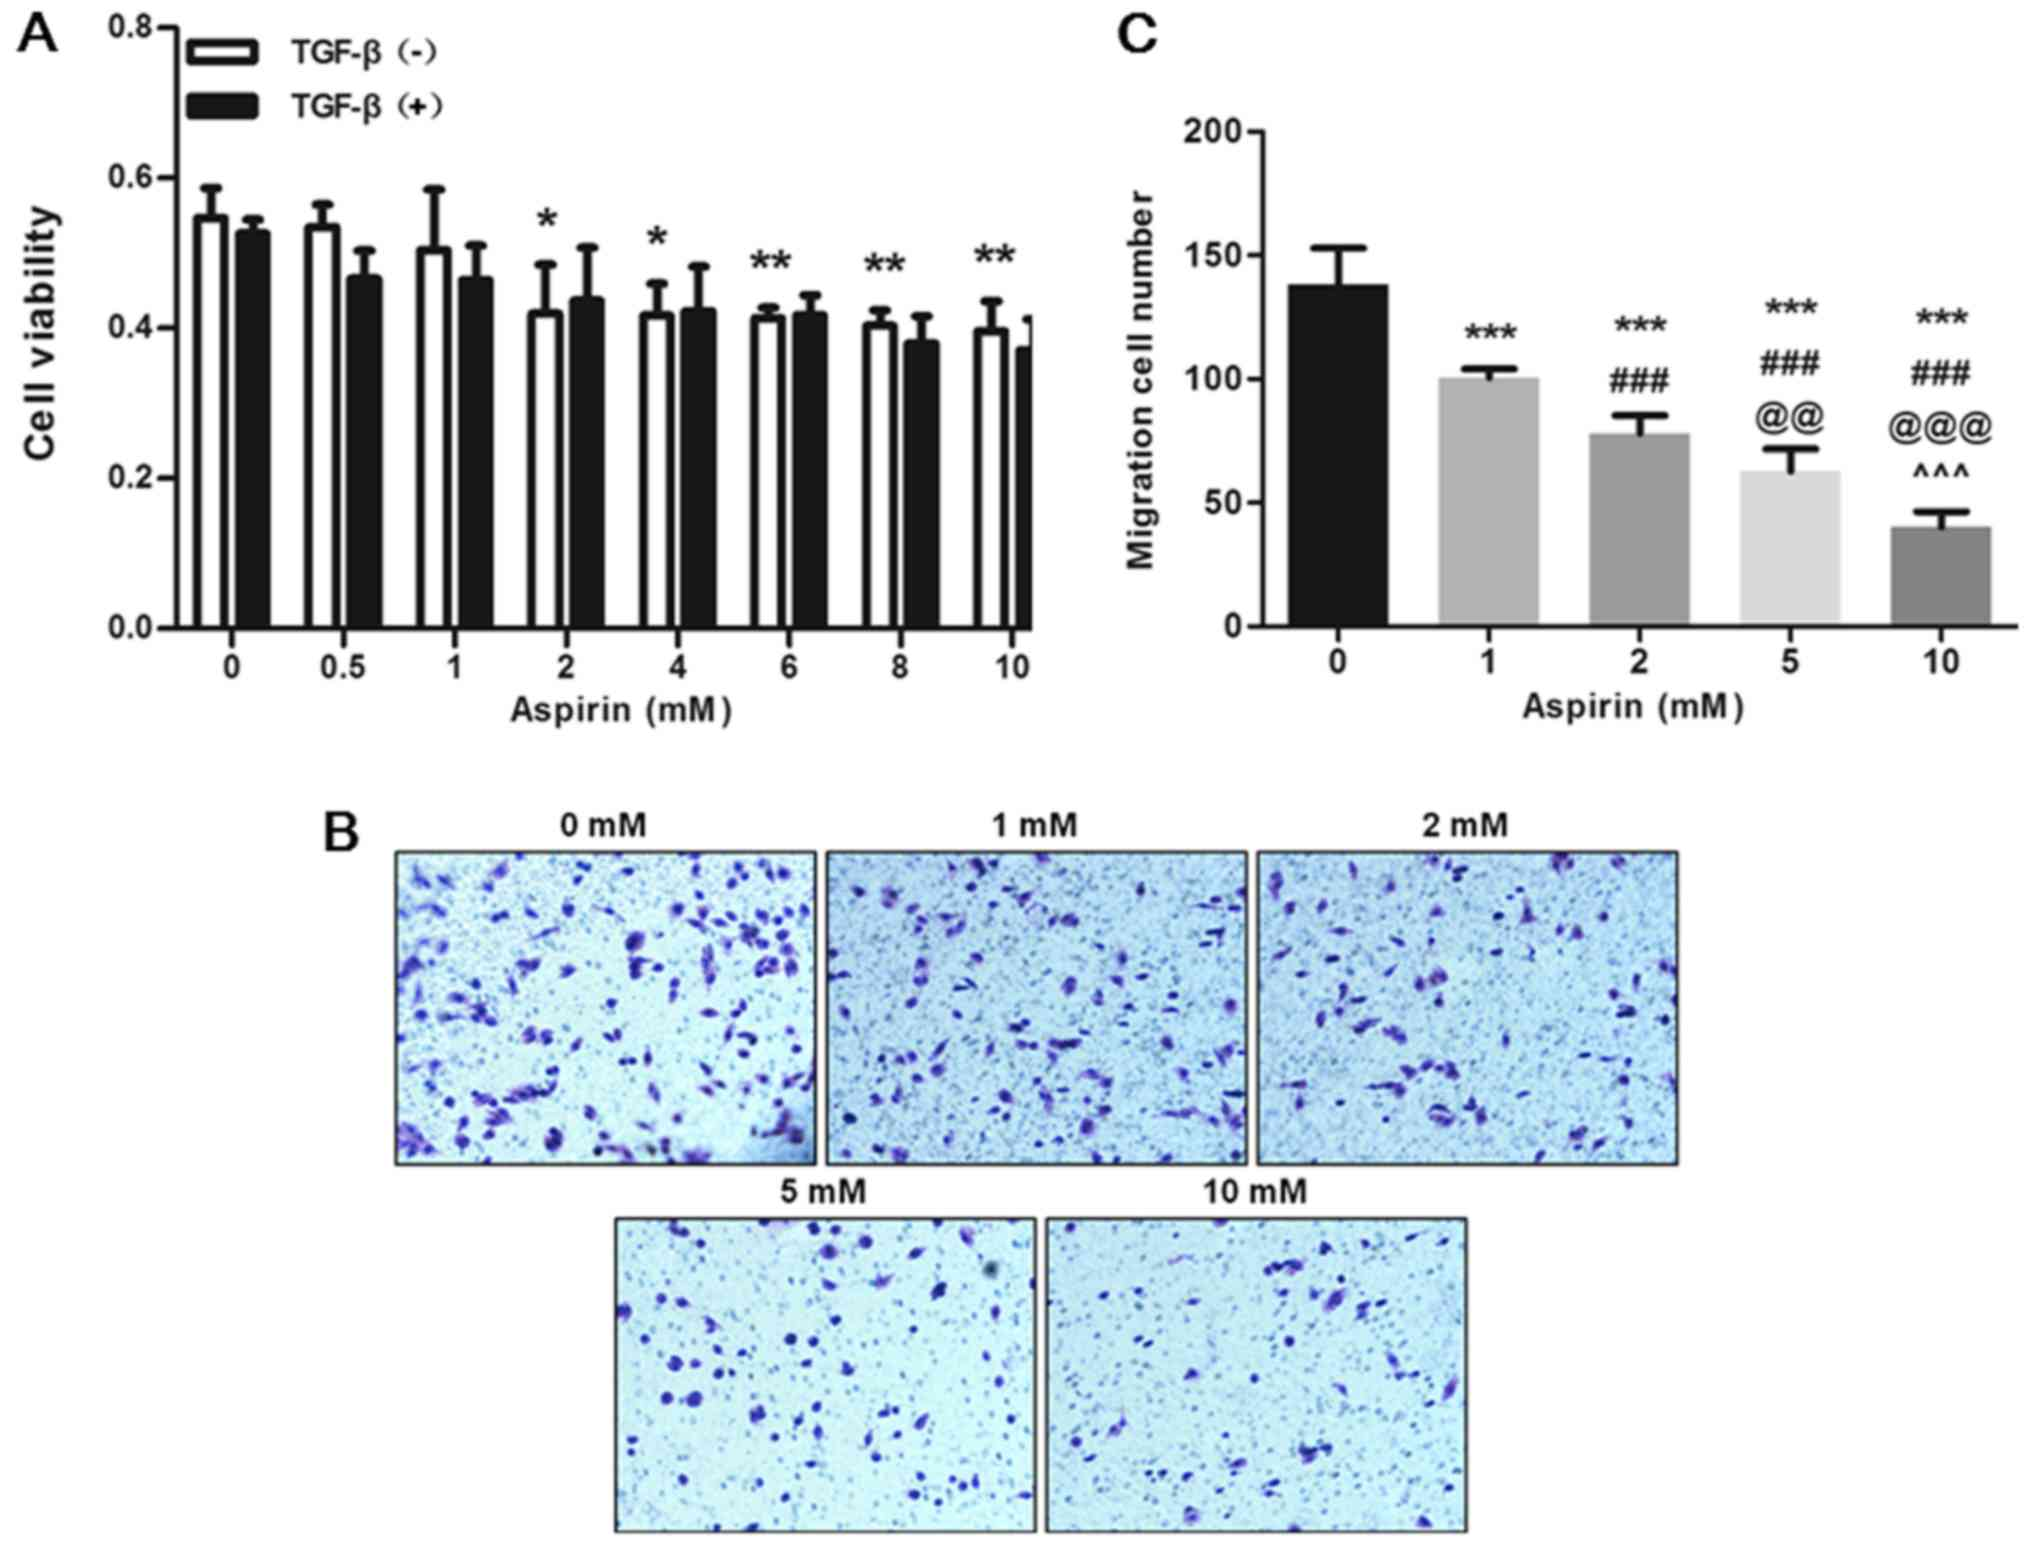 Aspirin Inhibits Colon Cancer Cell Line Migration Through Regulating Epithelial Mesenchymal Transition Via Wnt Signaling